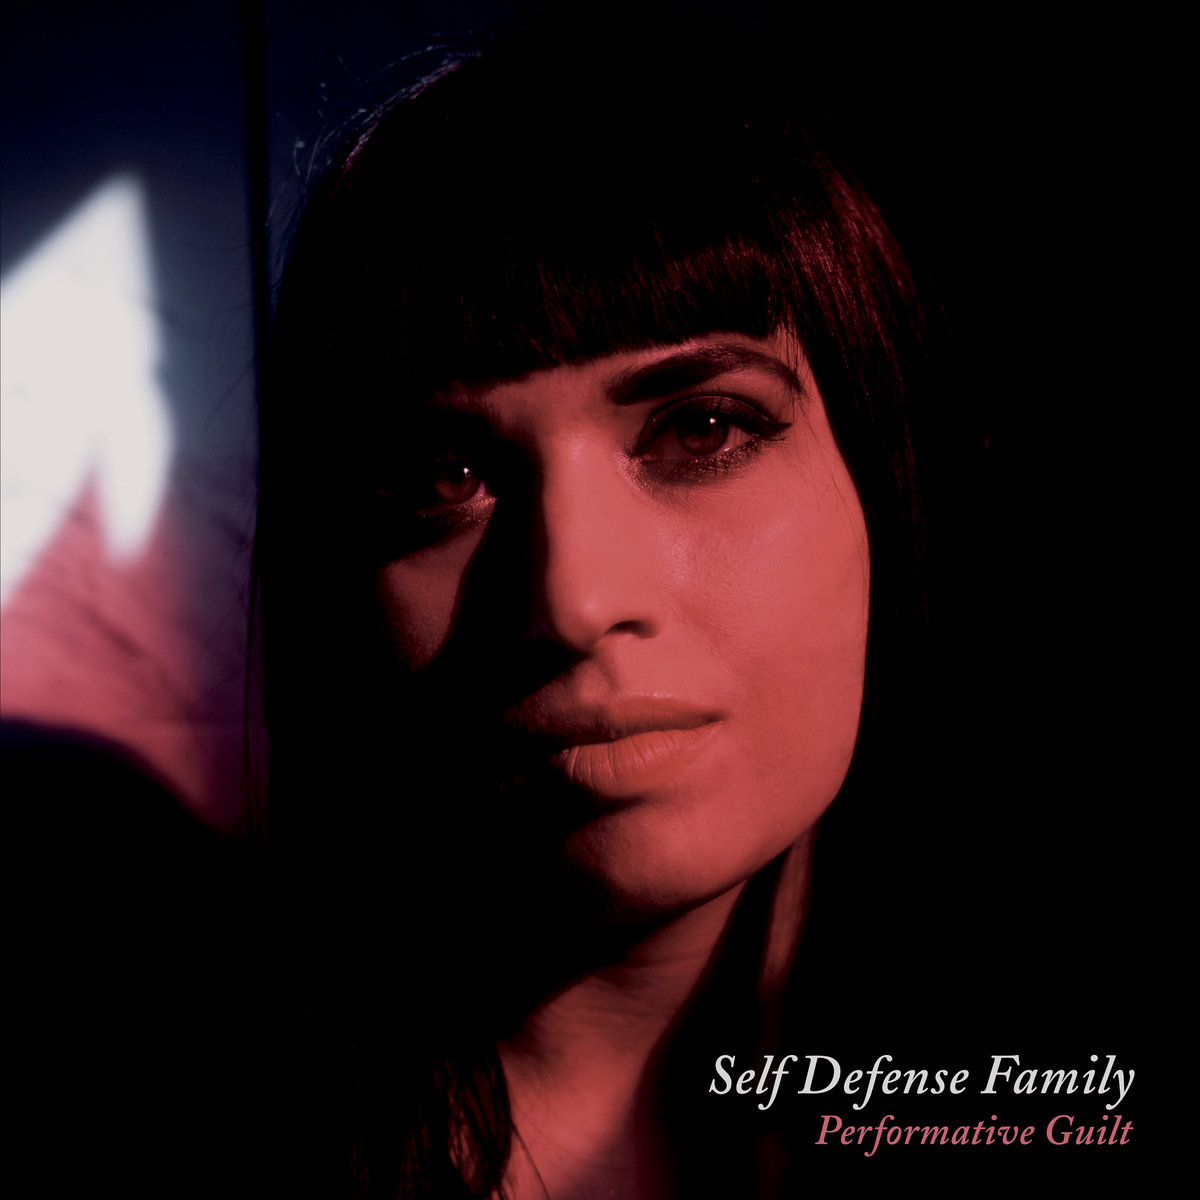 Self Defense Family - Performative Guilt